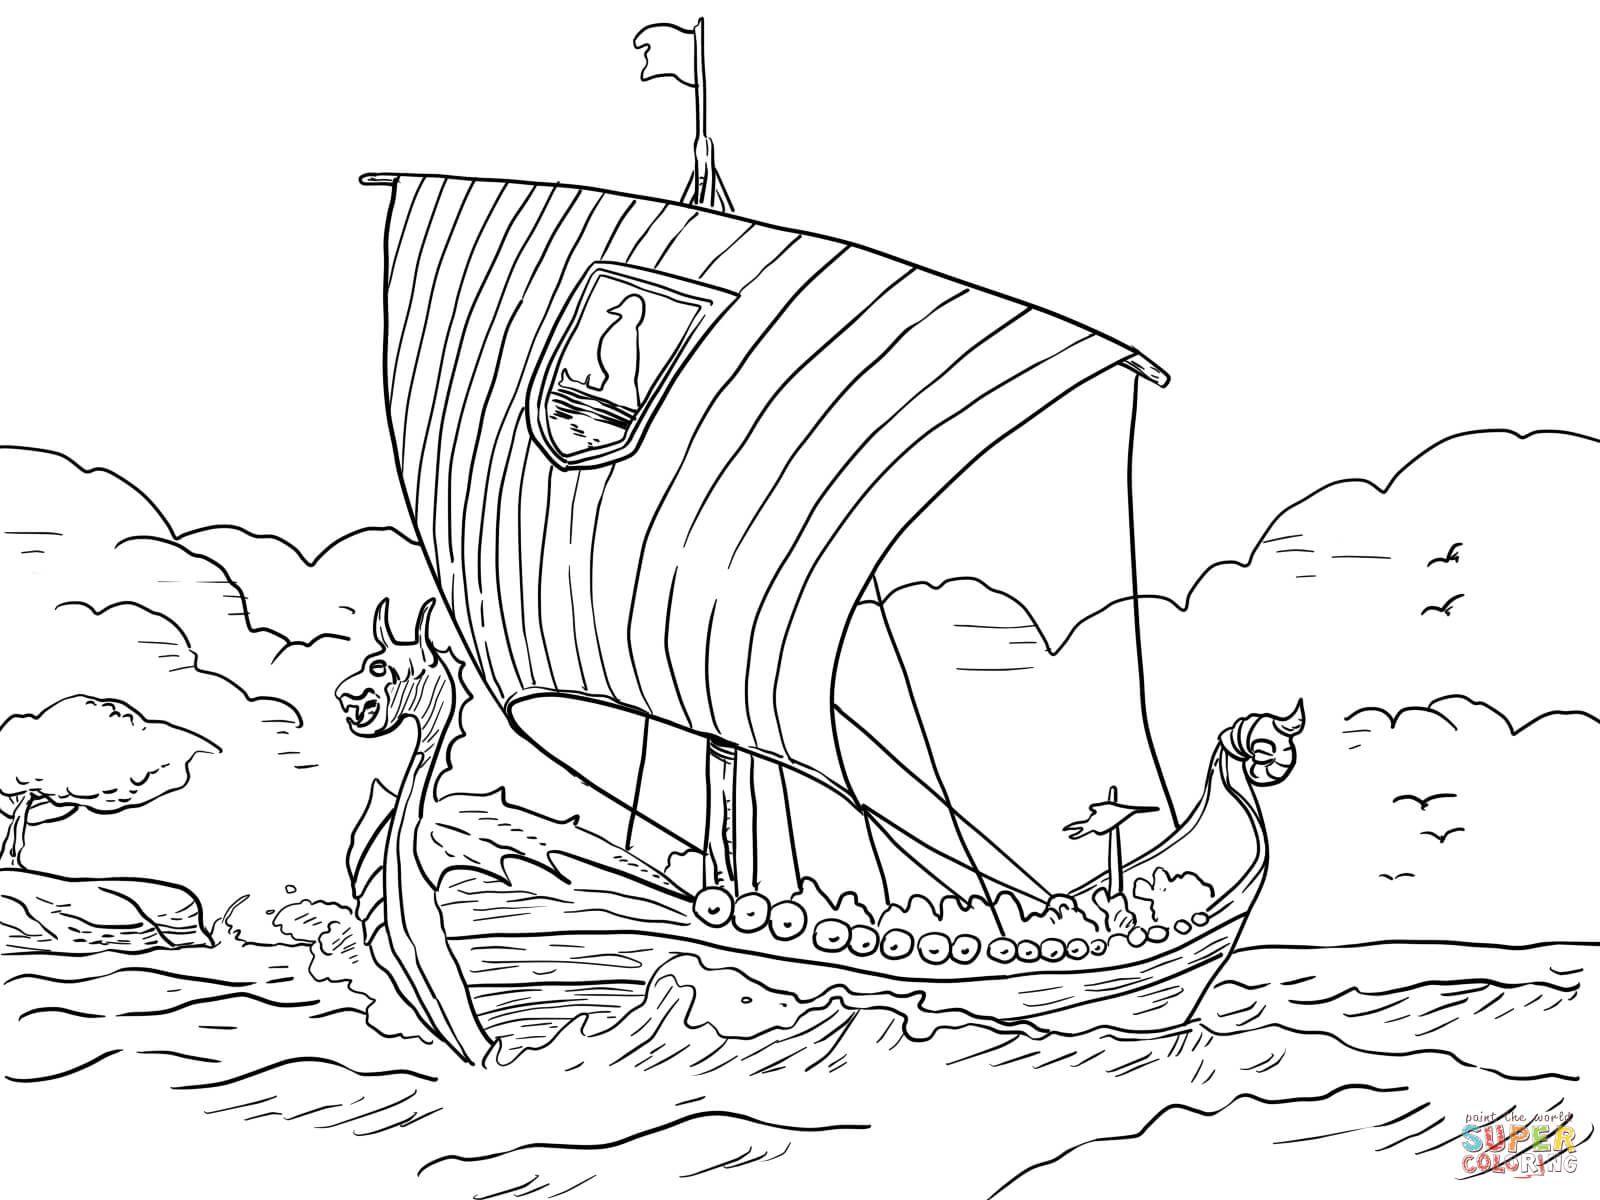 Longship Viking Sea Vessel coloring page | Free Printable Coloring ...